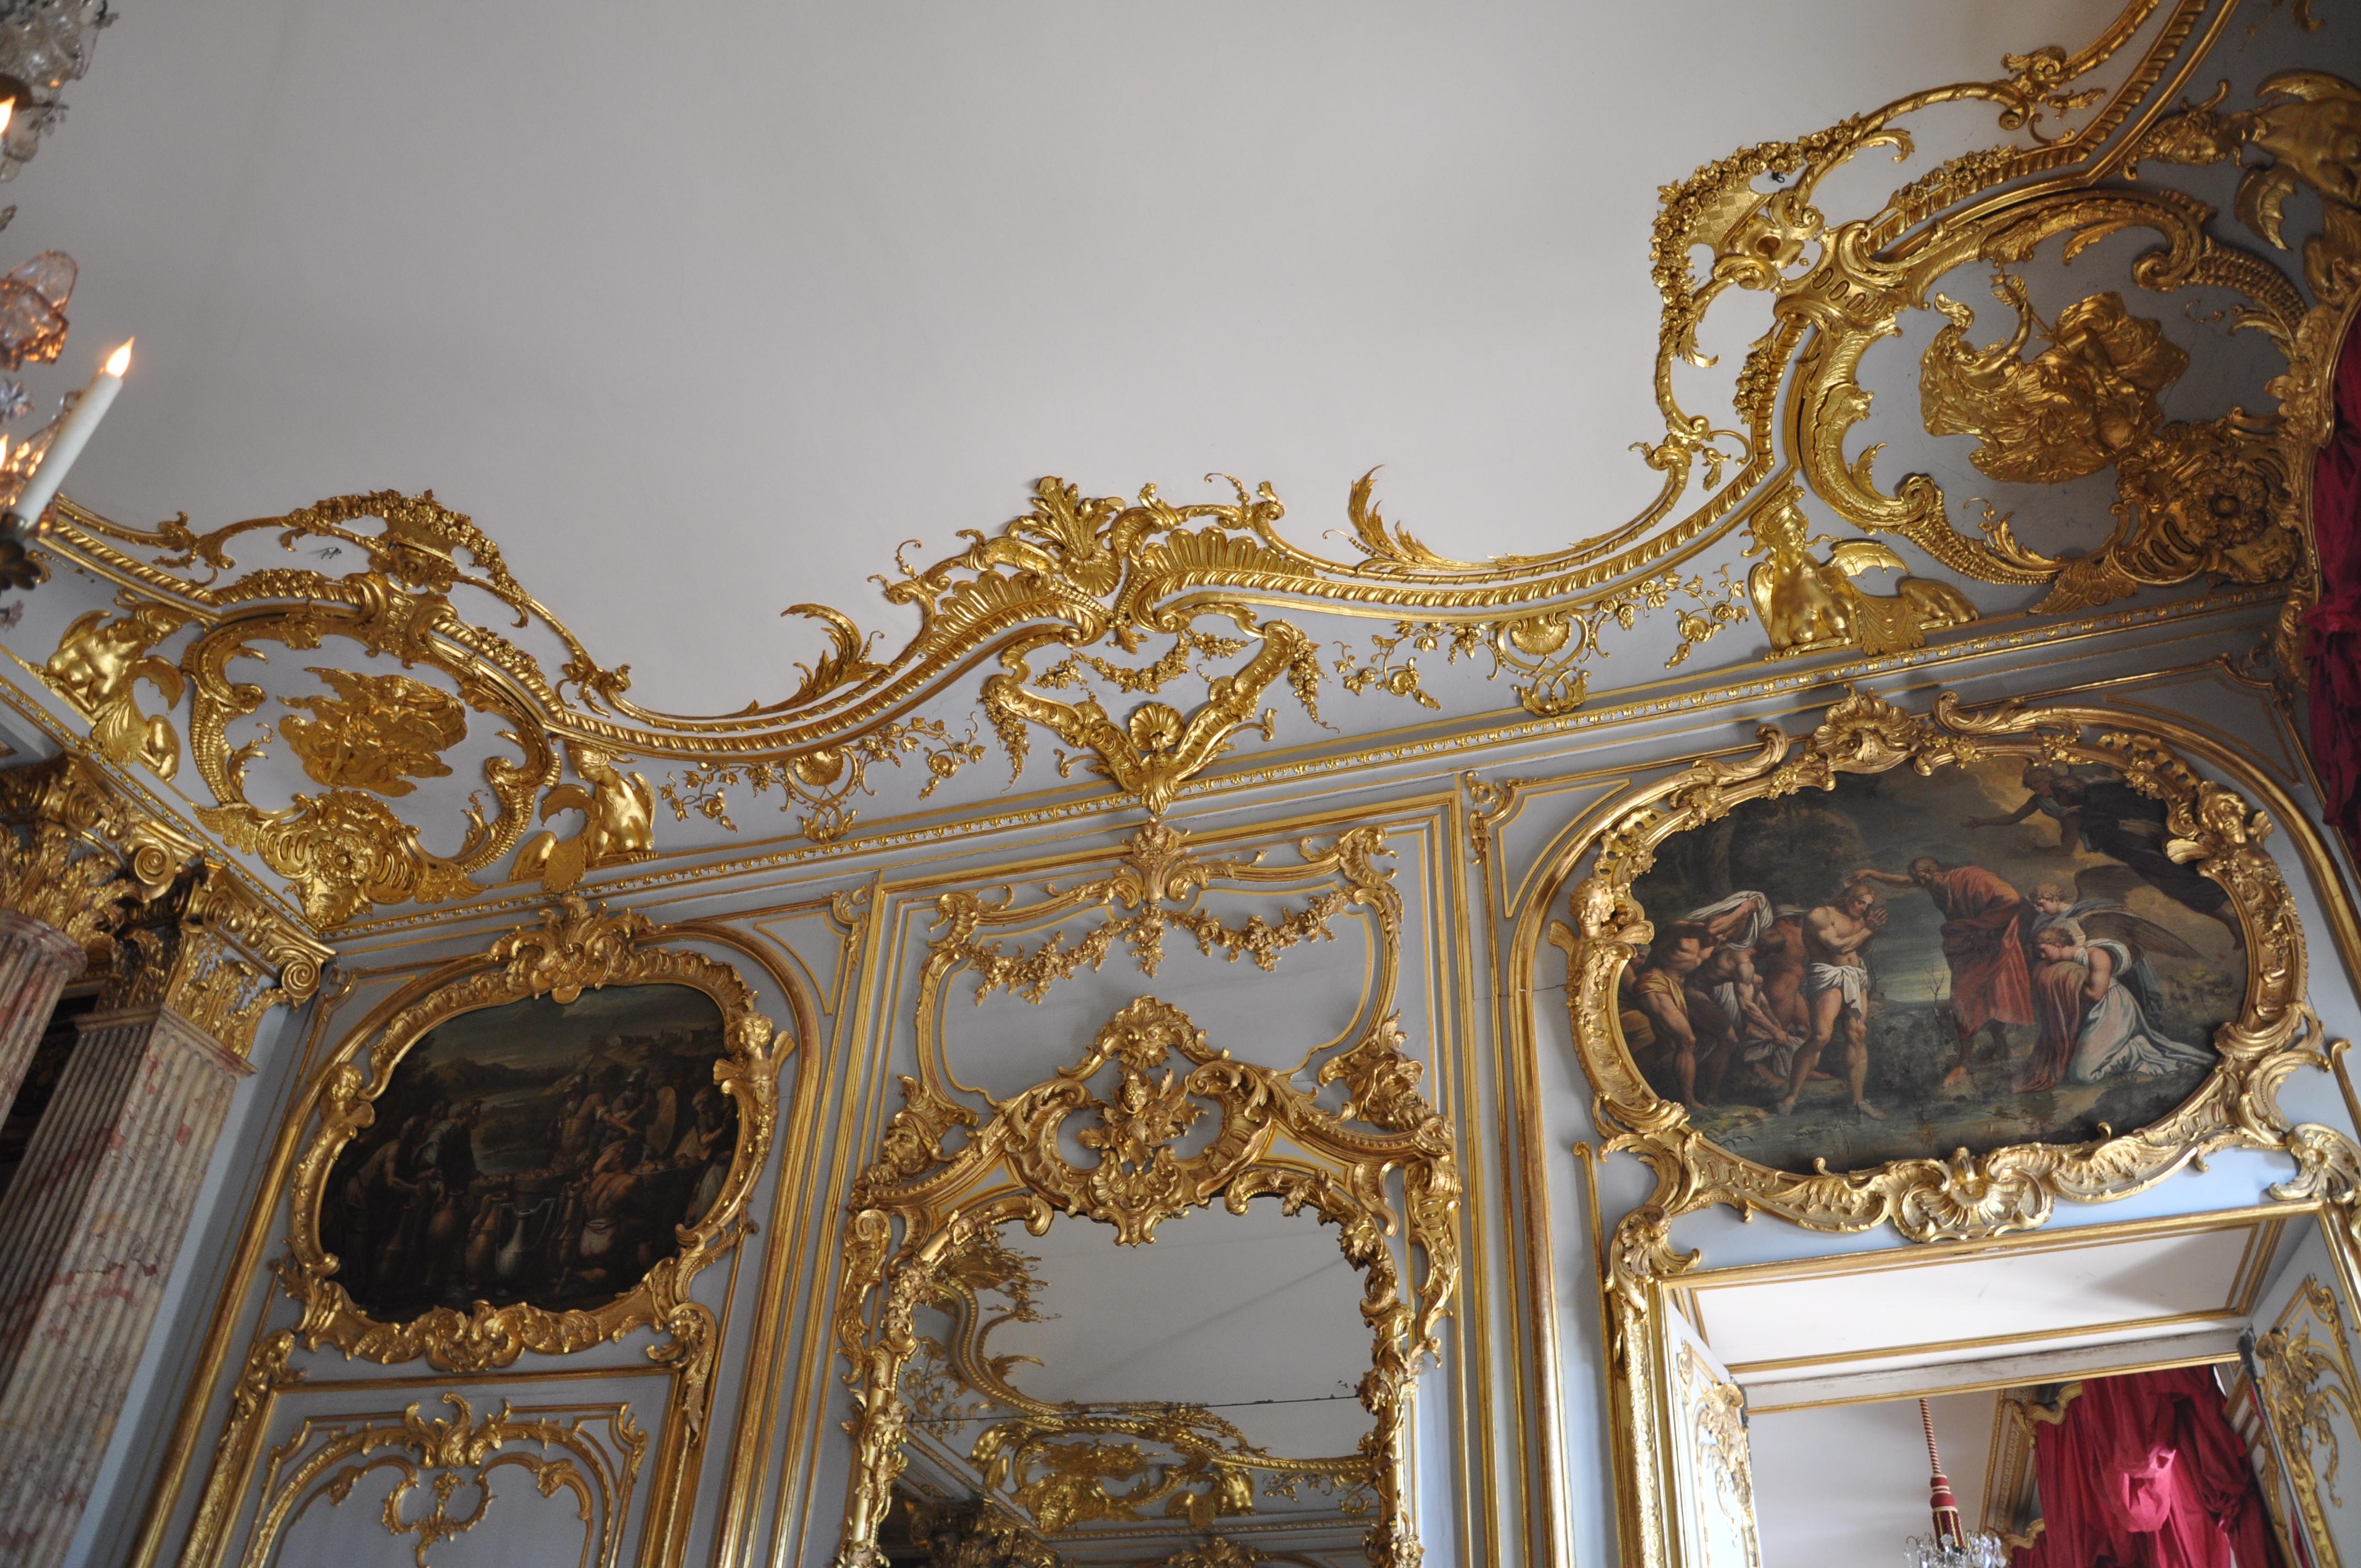 Décoration_-rocaille-,_Palais_Rohan,_Strasbourg